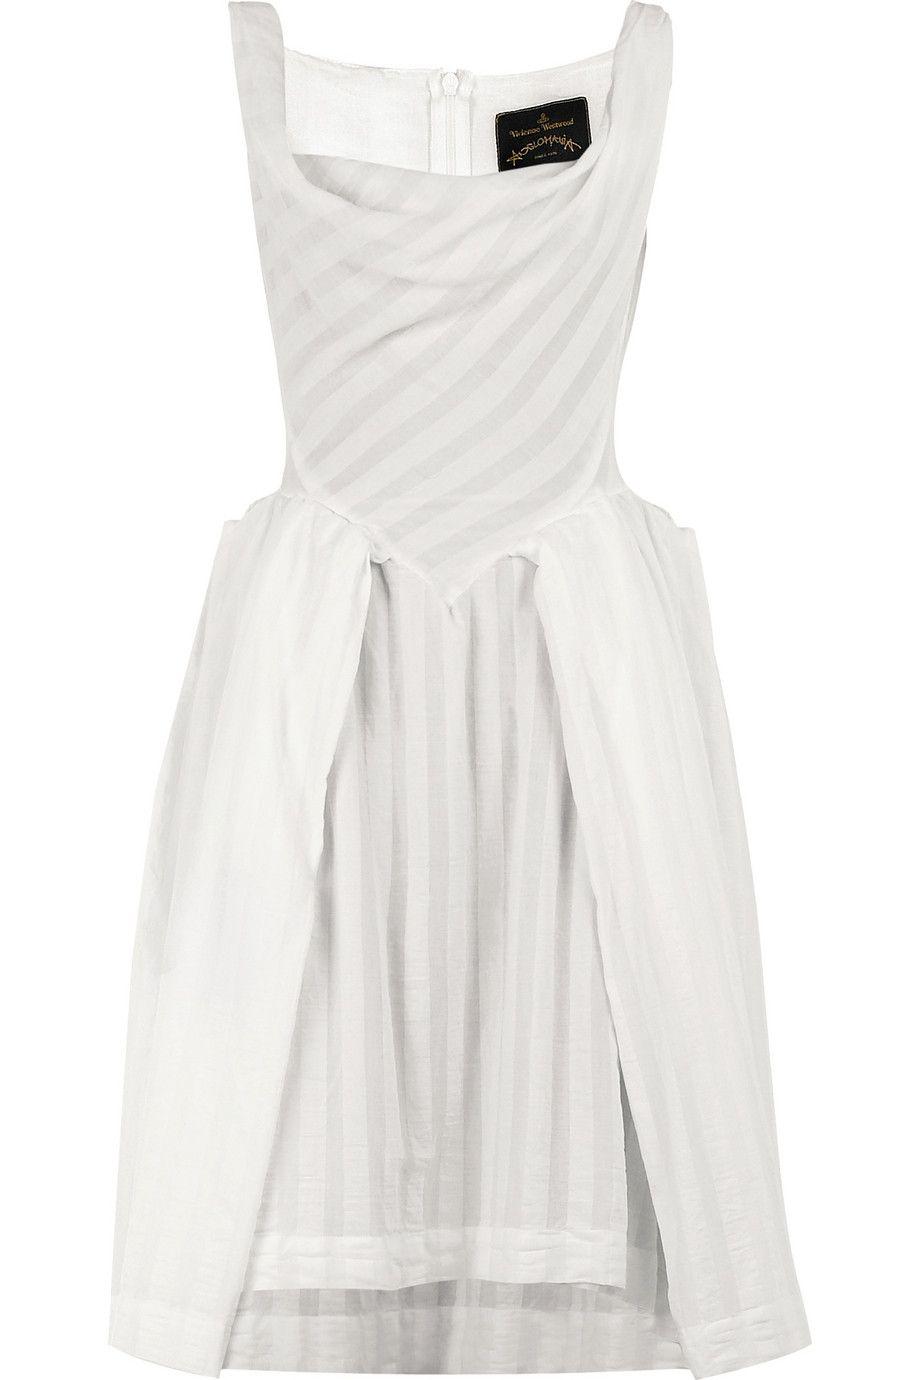 Vivienne Westwood Anglomania - Sunday Dress | Wedding Dresses ...